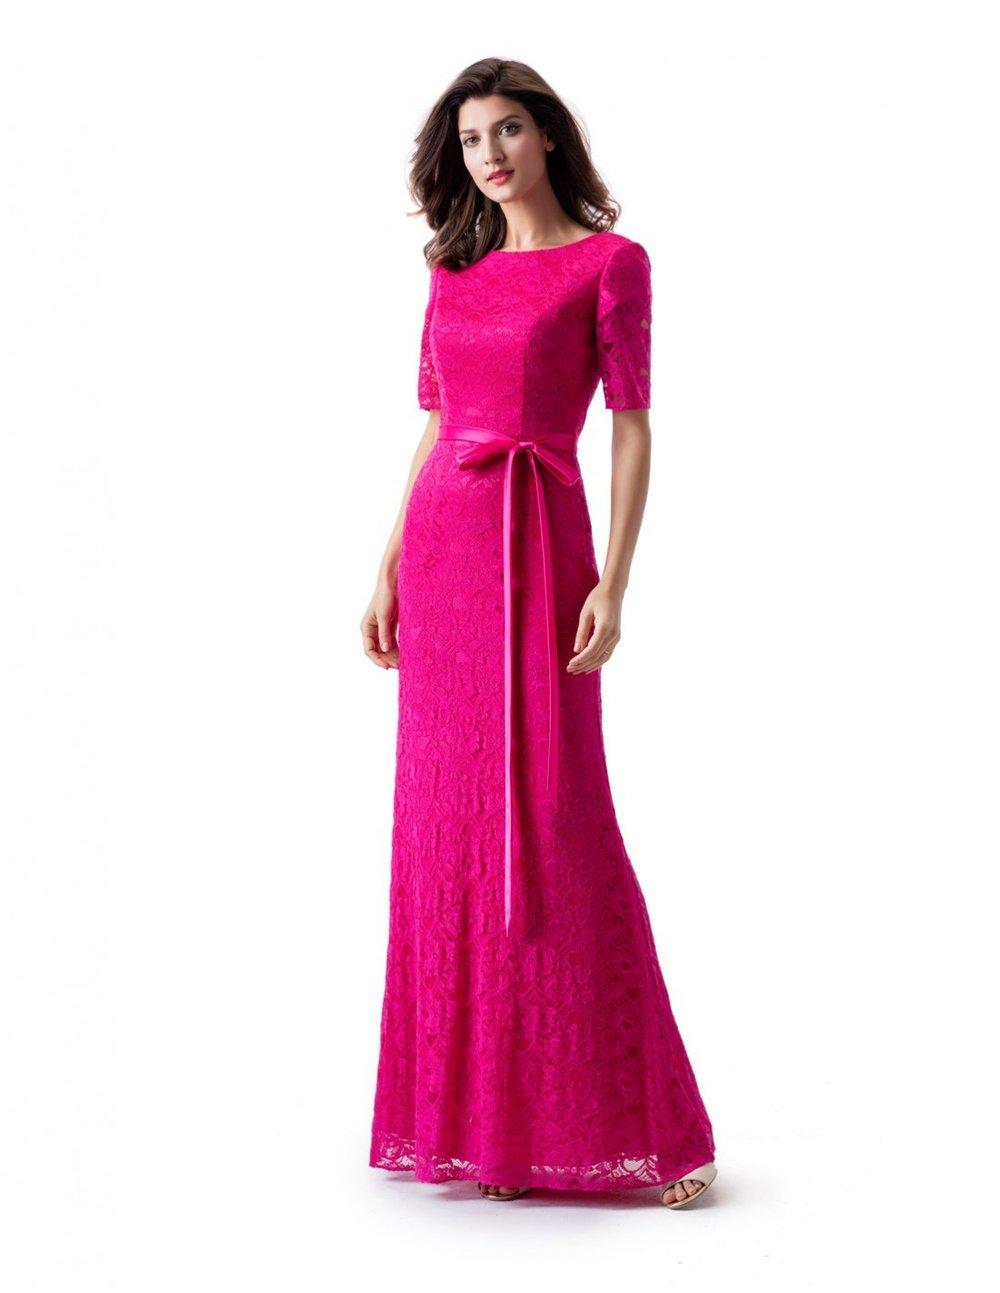 Venus TM1823 Hot Raspberry Modest Prom